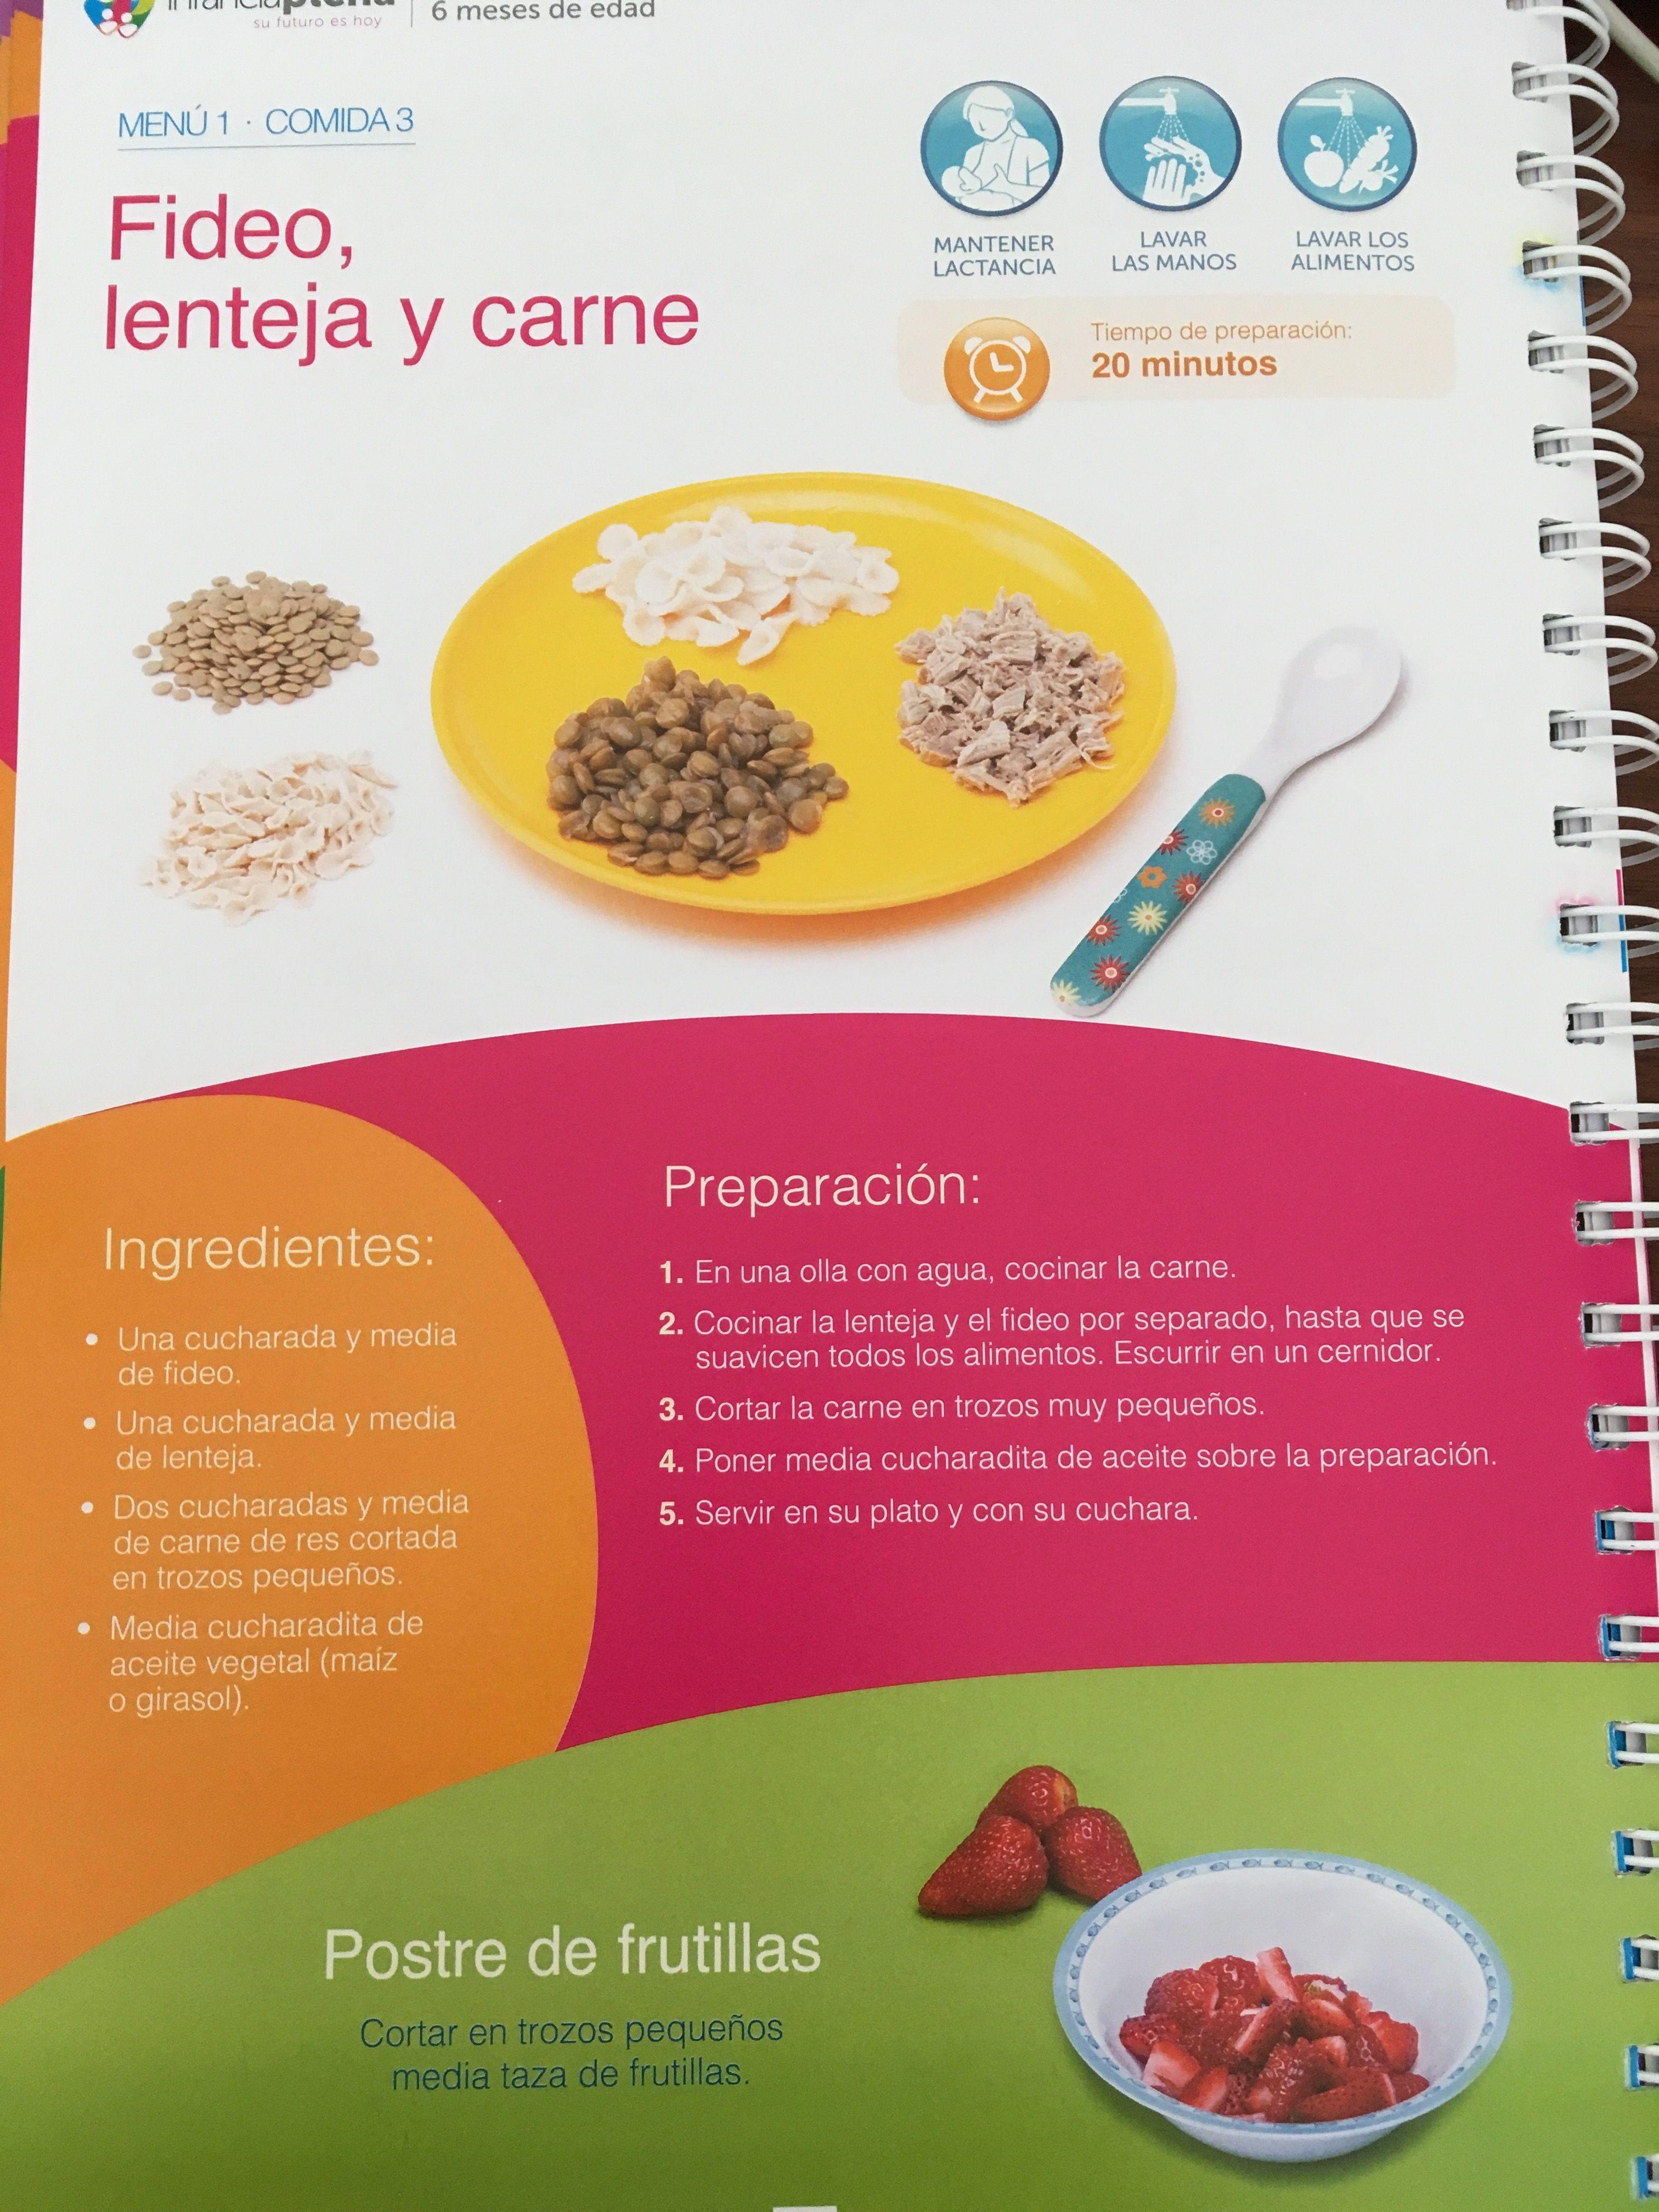 Menu De Fideo Lenteja Y Carne De 1 A 2 Anos Recetas De Comida